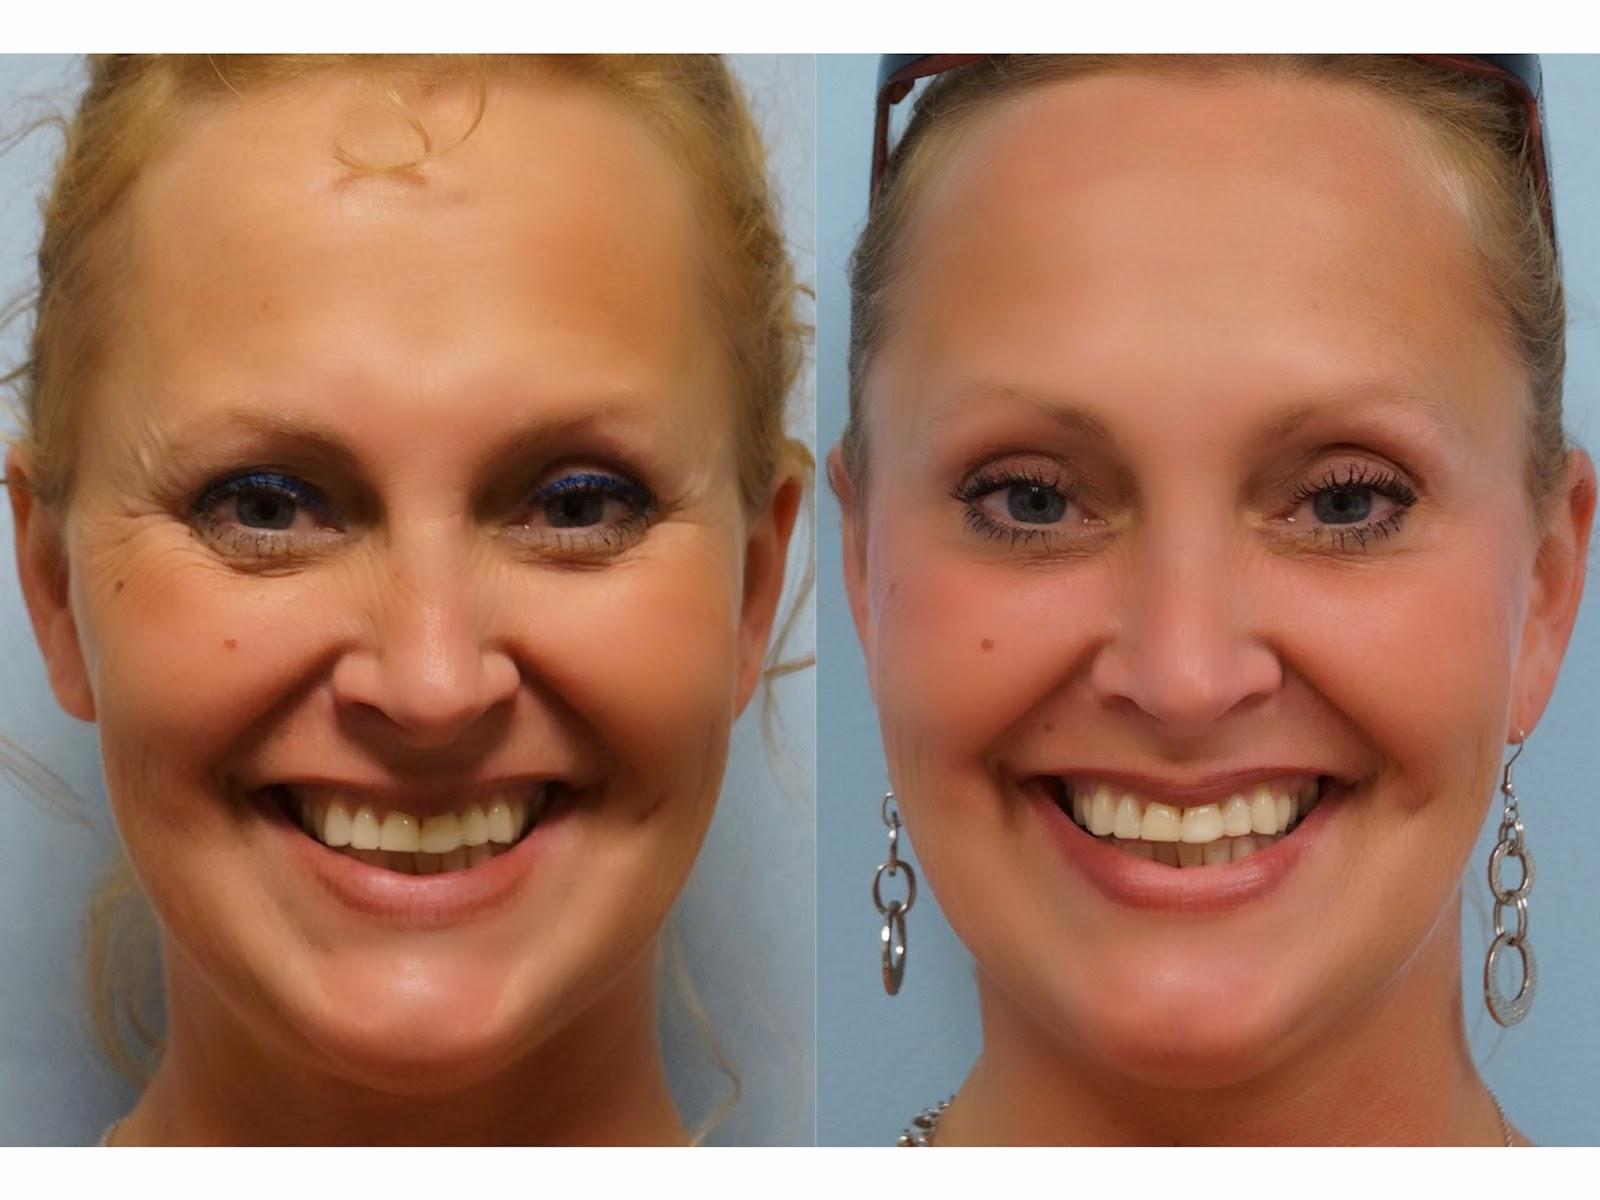 Facial Plastic Surgery: Botox browlift, Nonsurgical ...